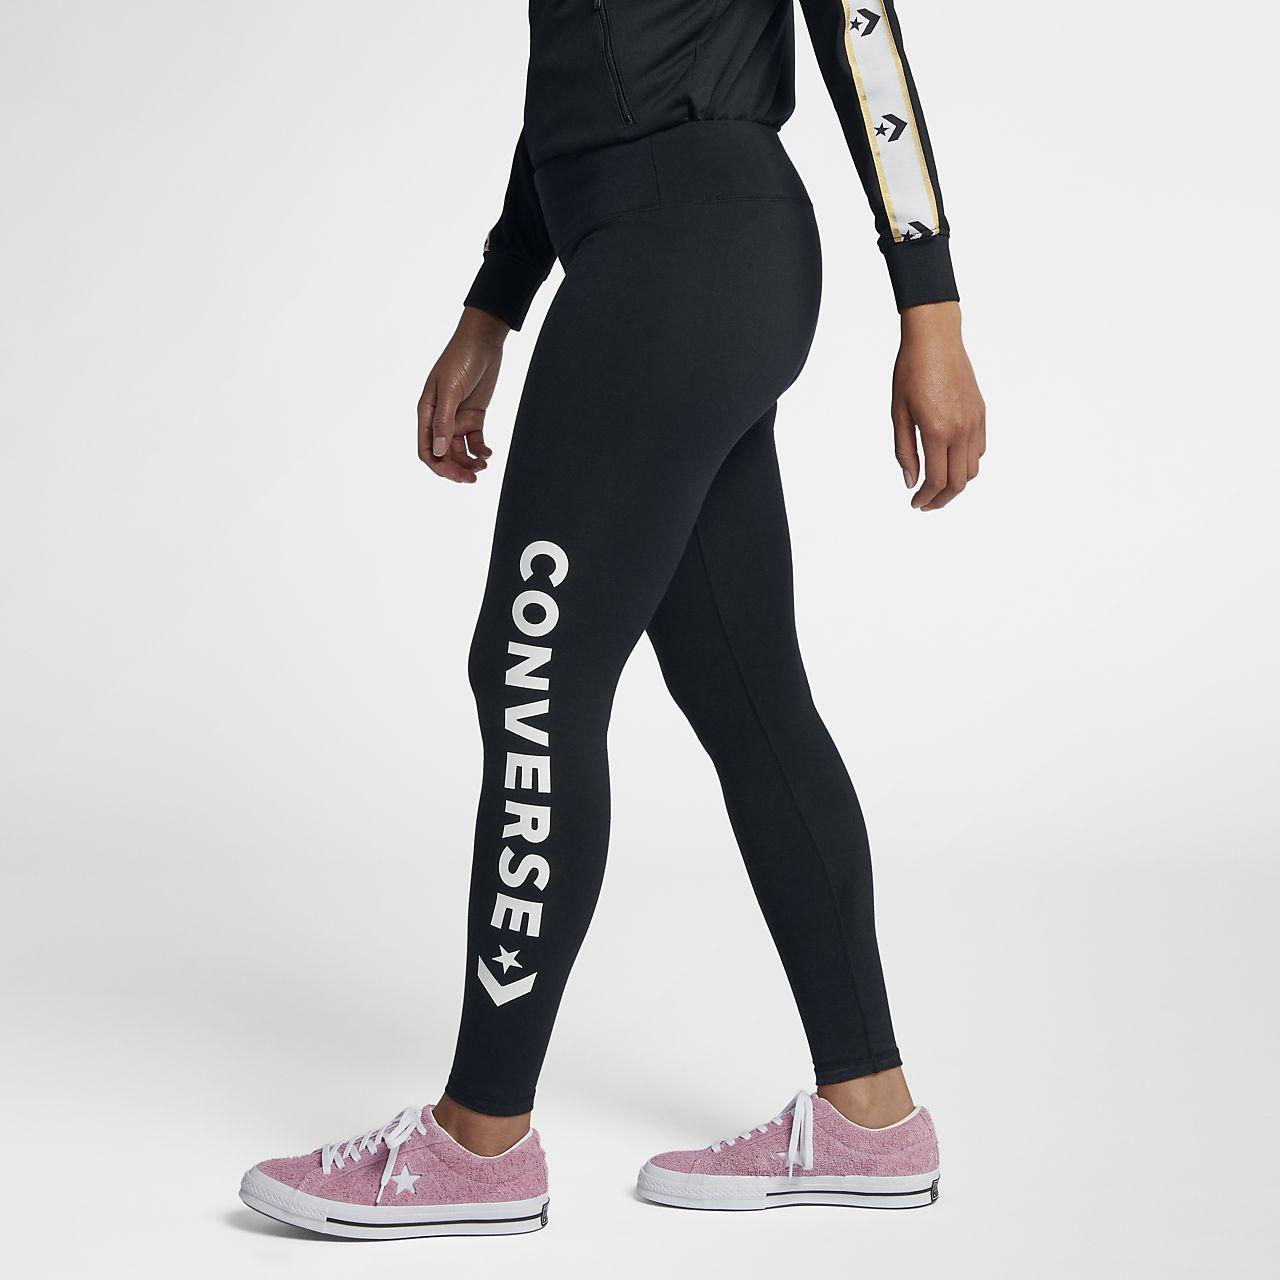 Converse Wordmark Women's Leggings